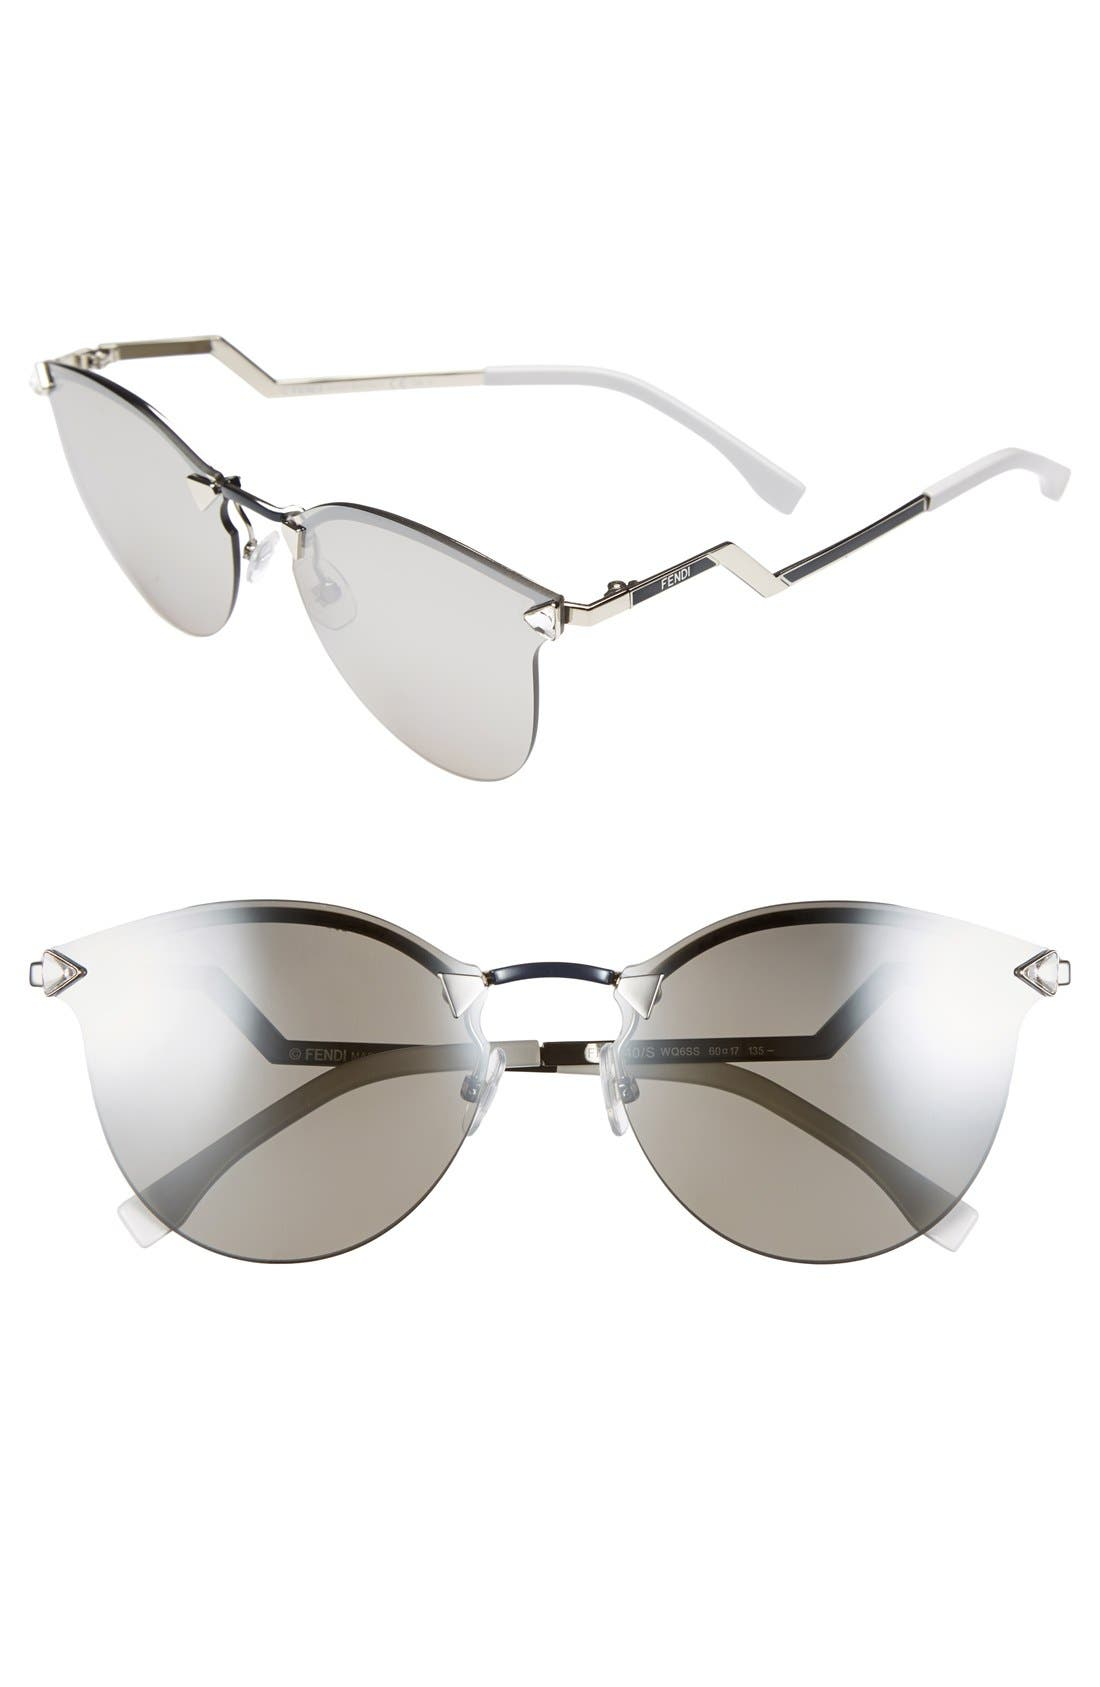 Main Image - Fendi 60mm Retro Sunglasses